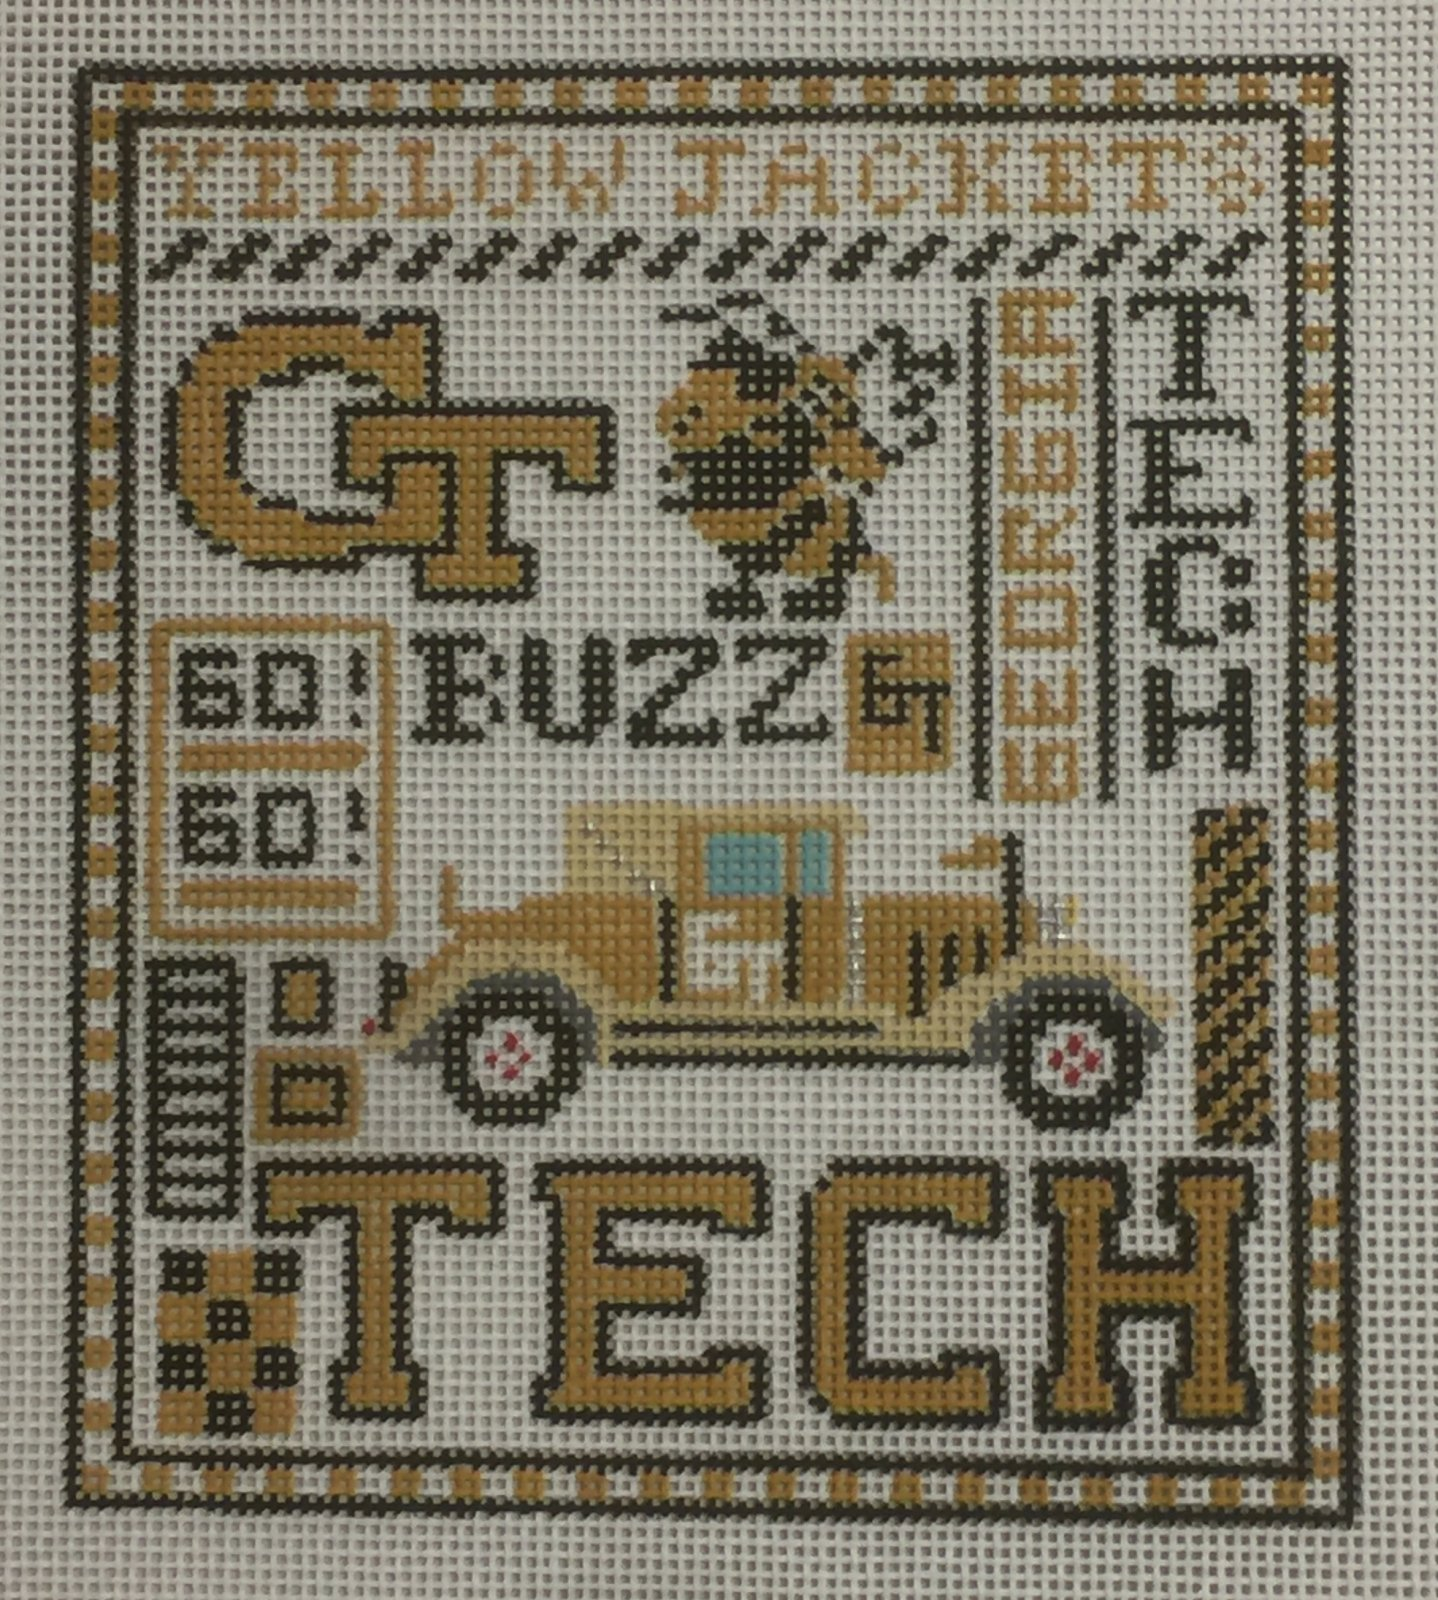 Georgia Tech Sampler